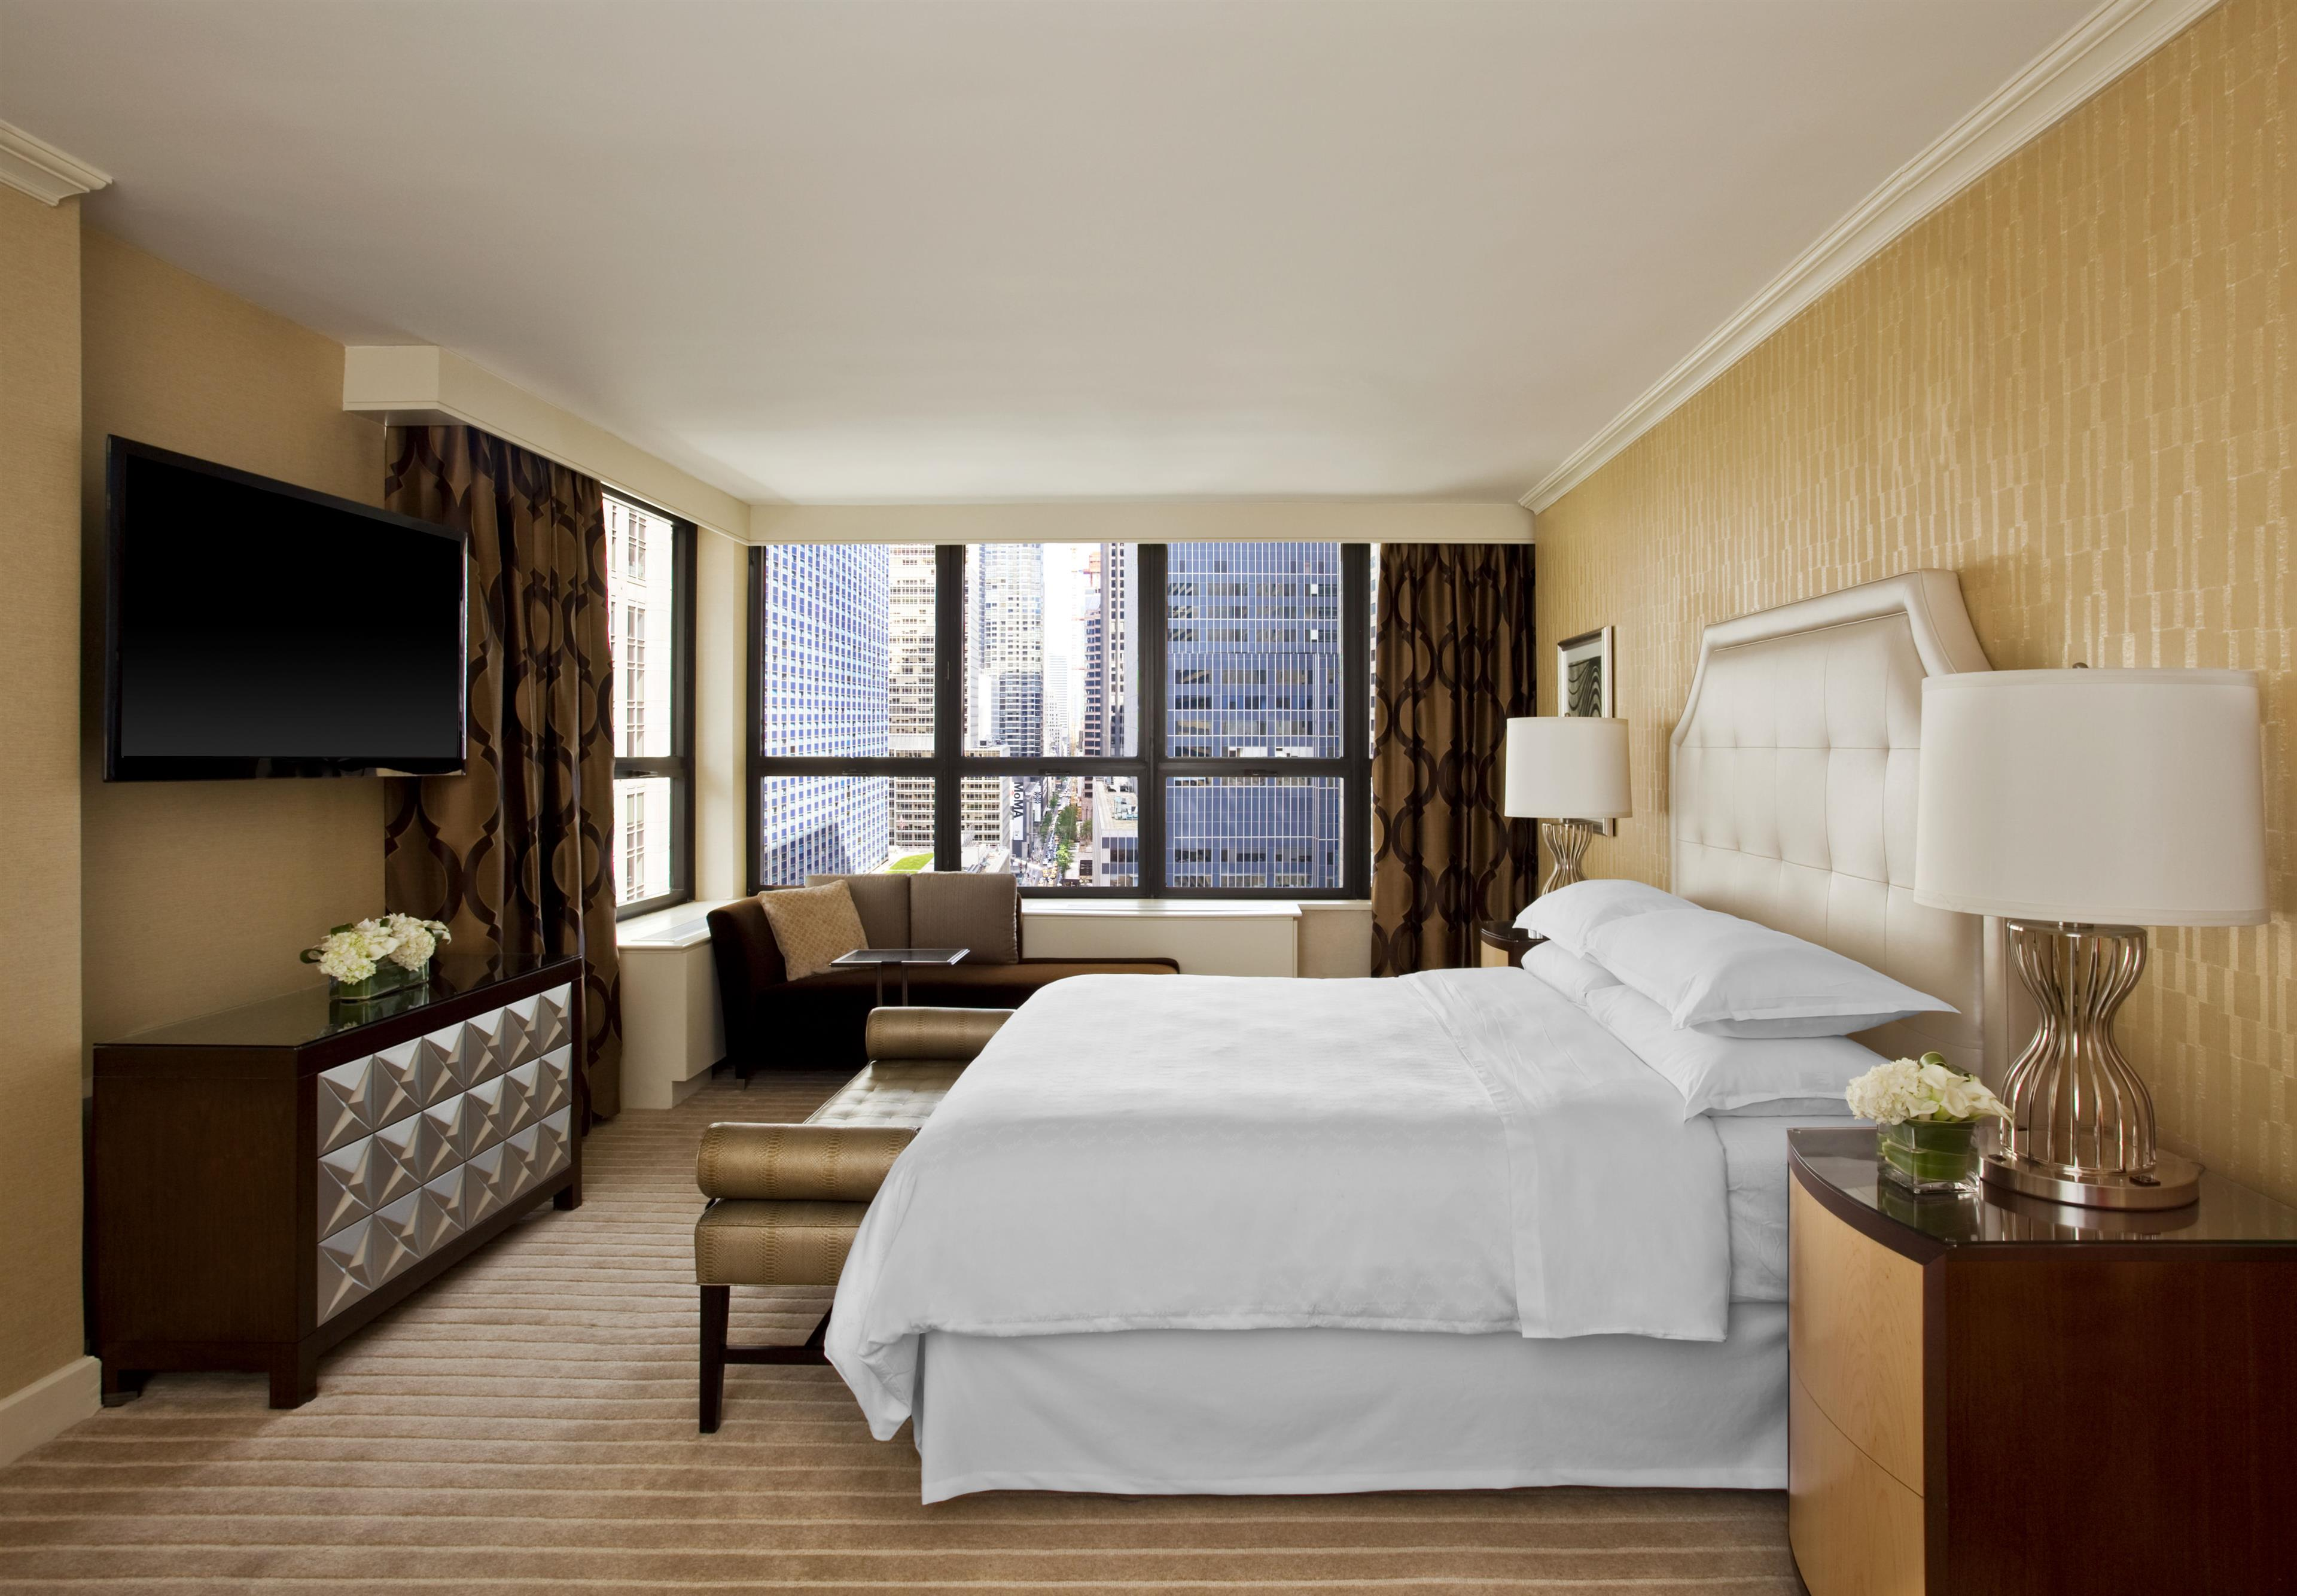 Sheraton New York Times Square Hotel image 3